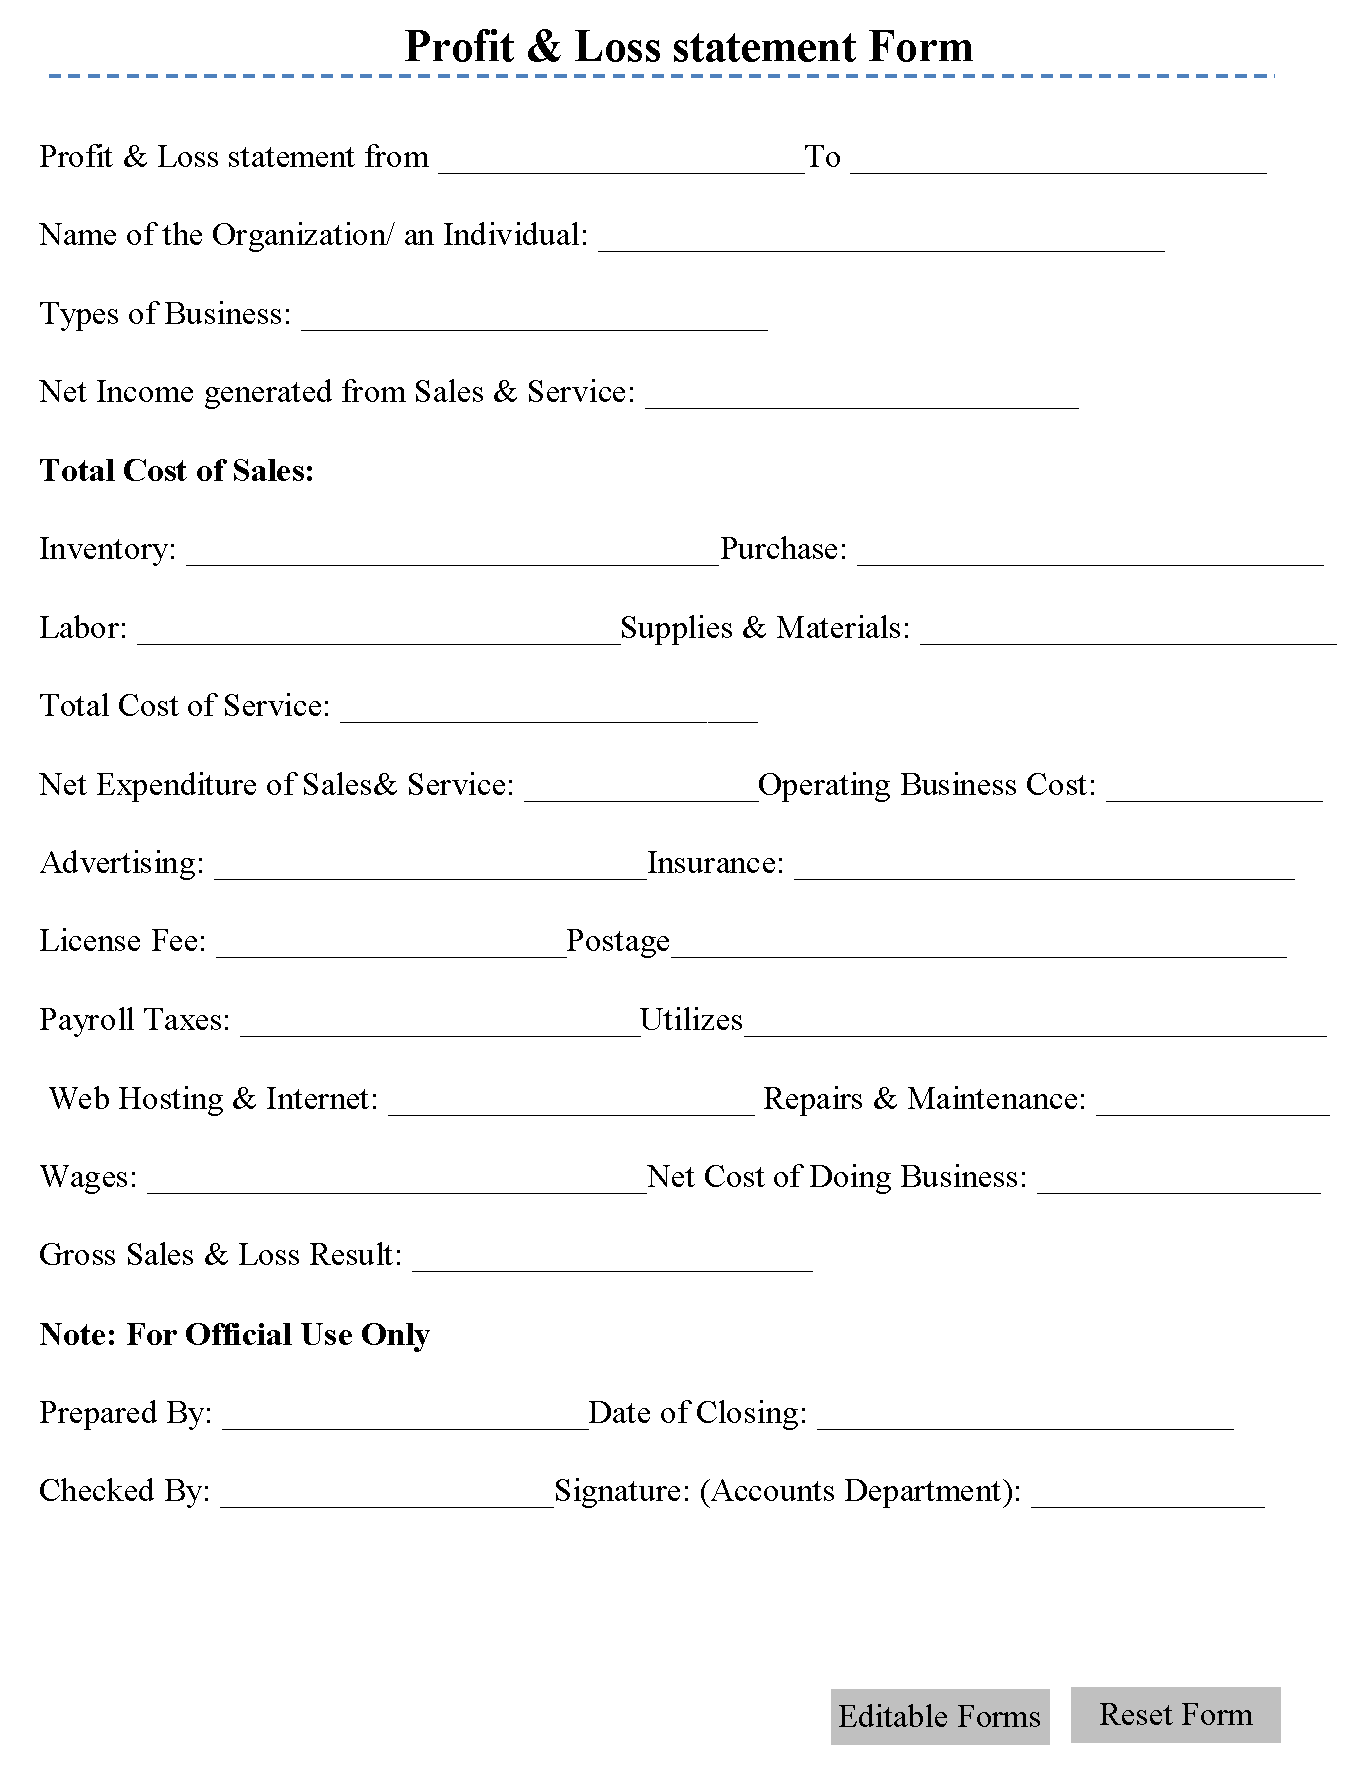 Profit Amp Loss Statement Form